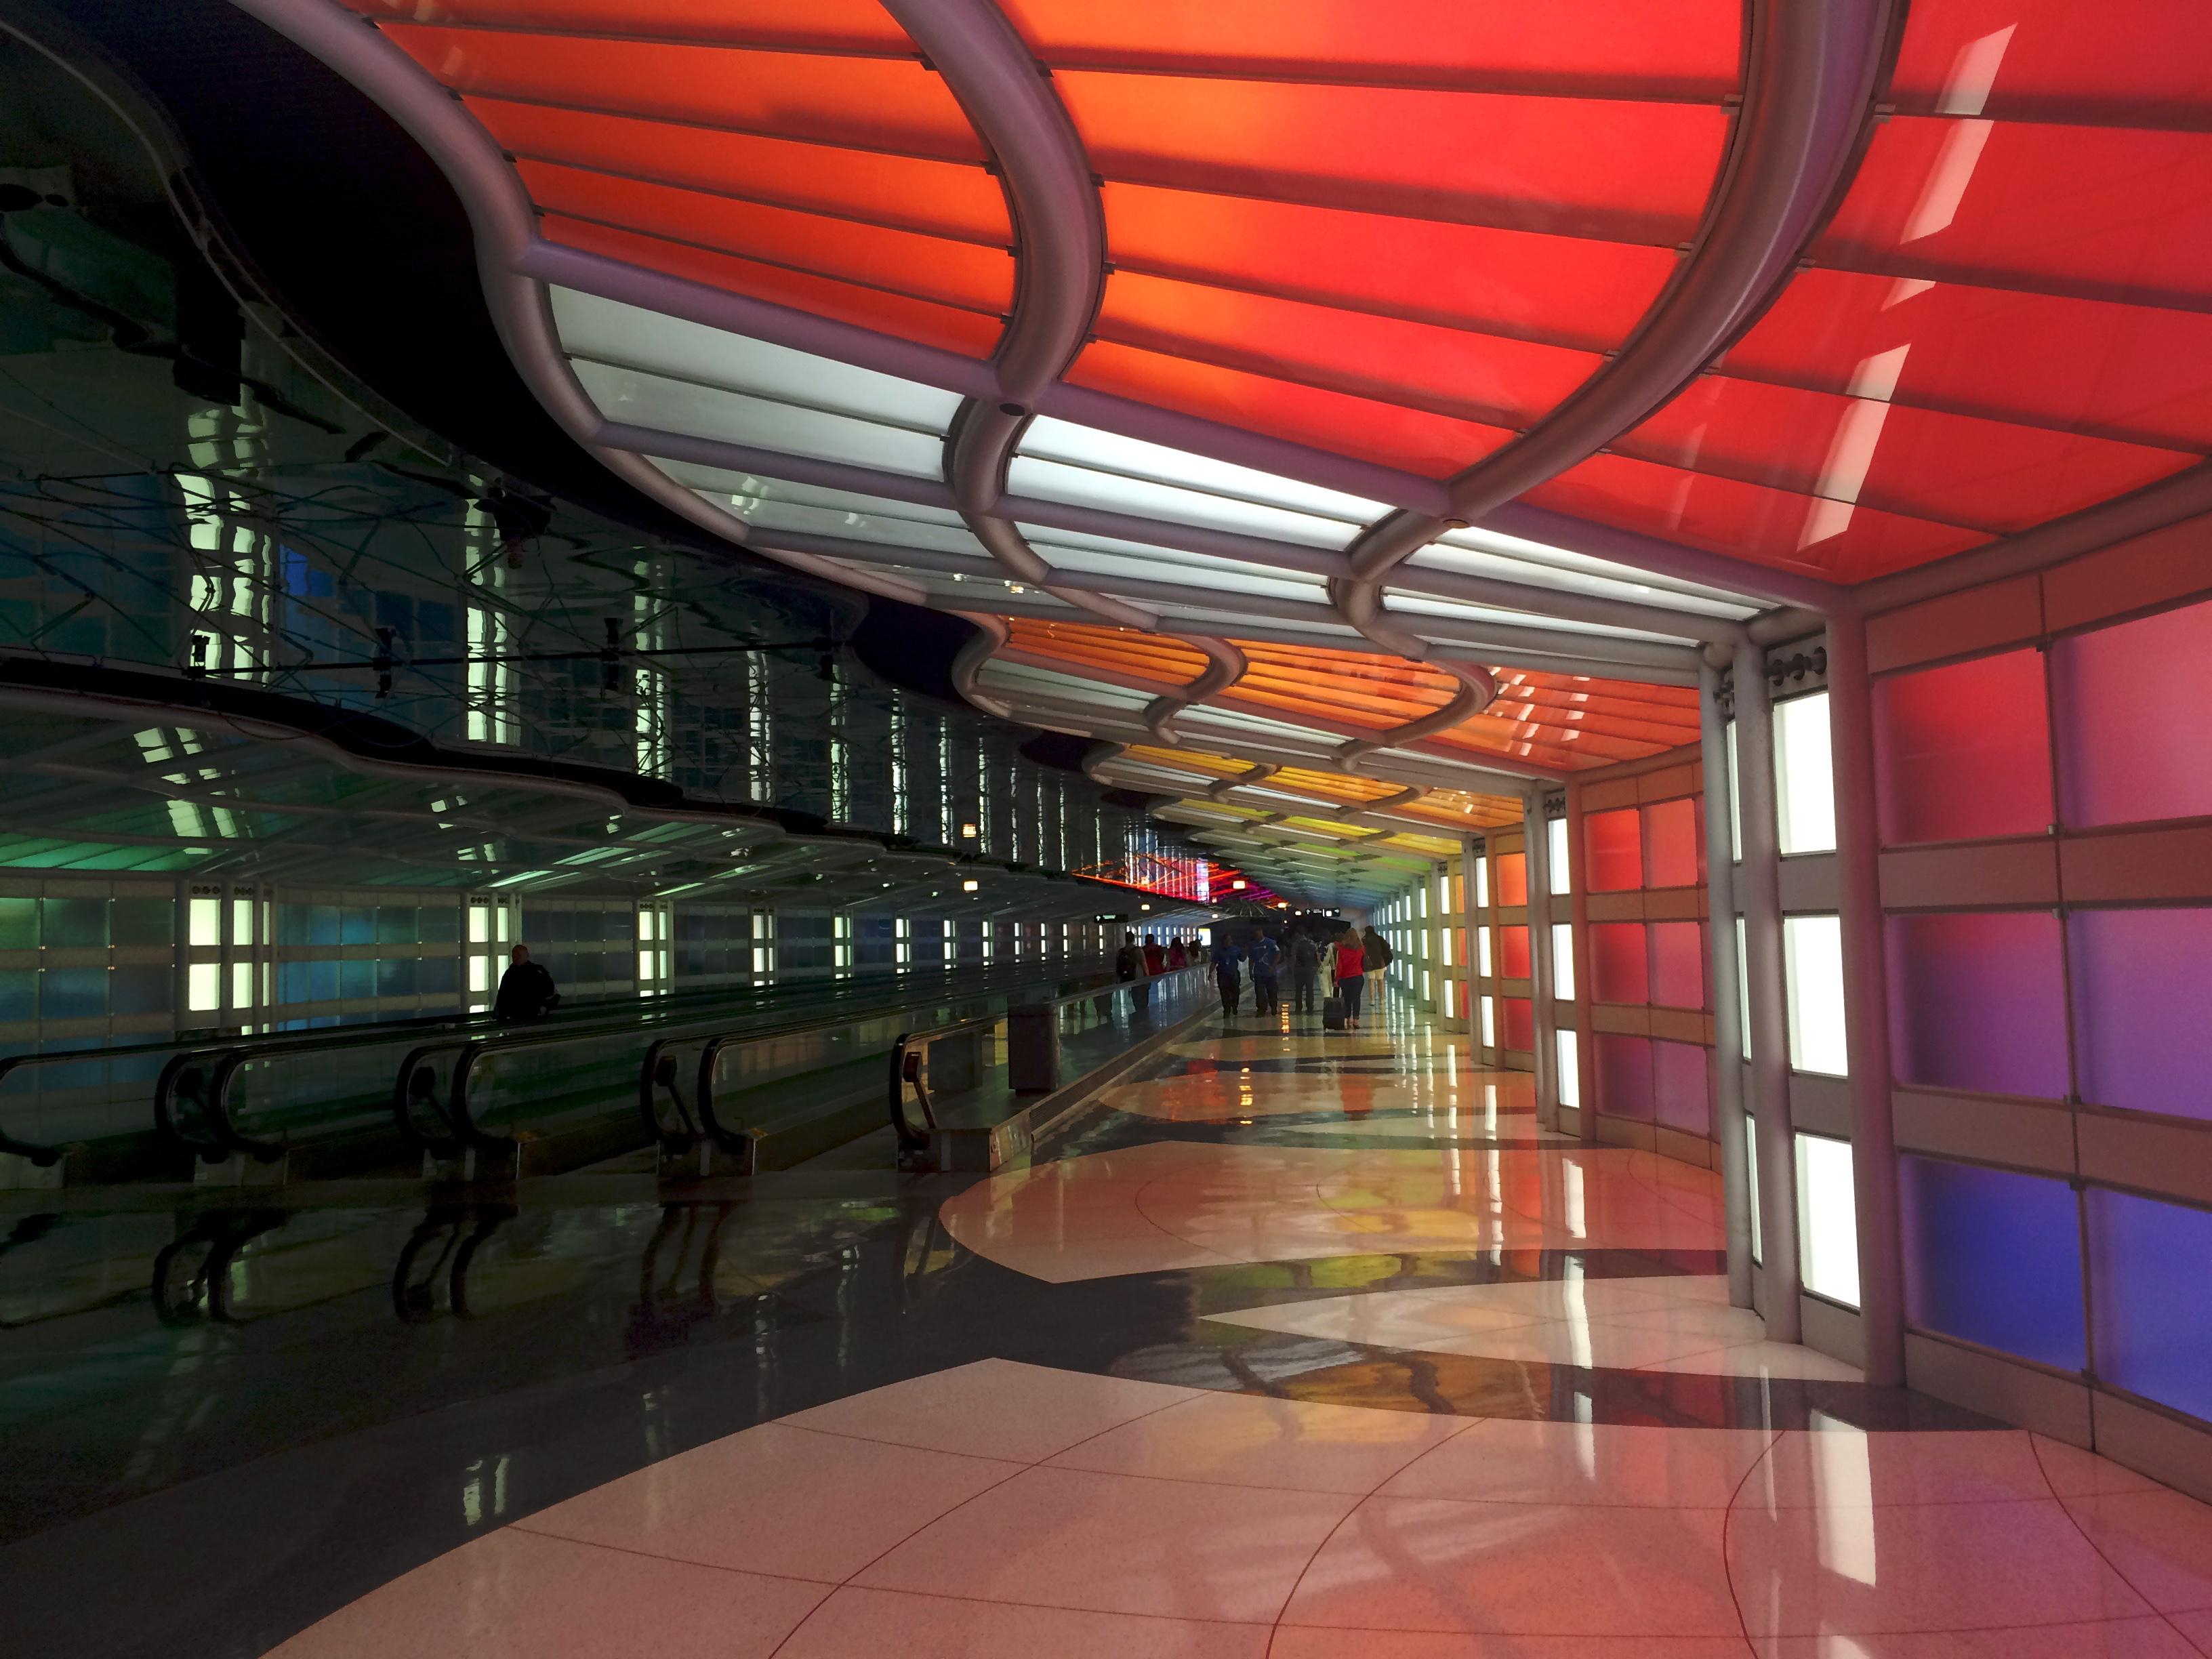 Inside Chicago O'Hare